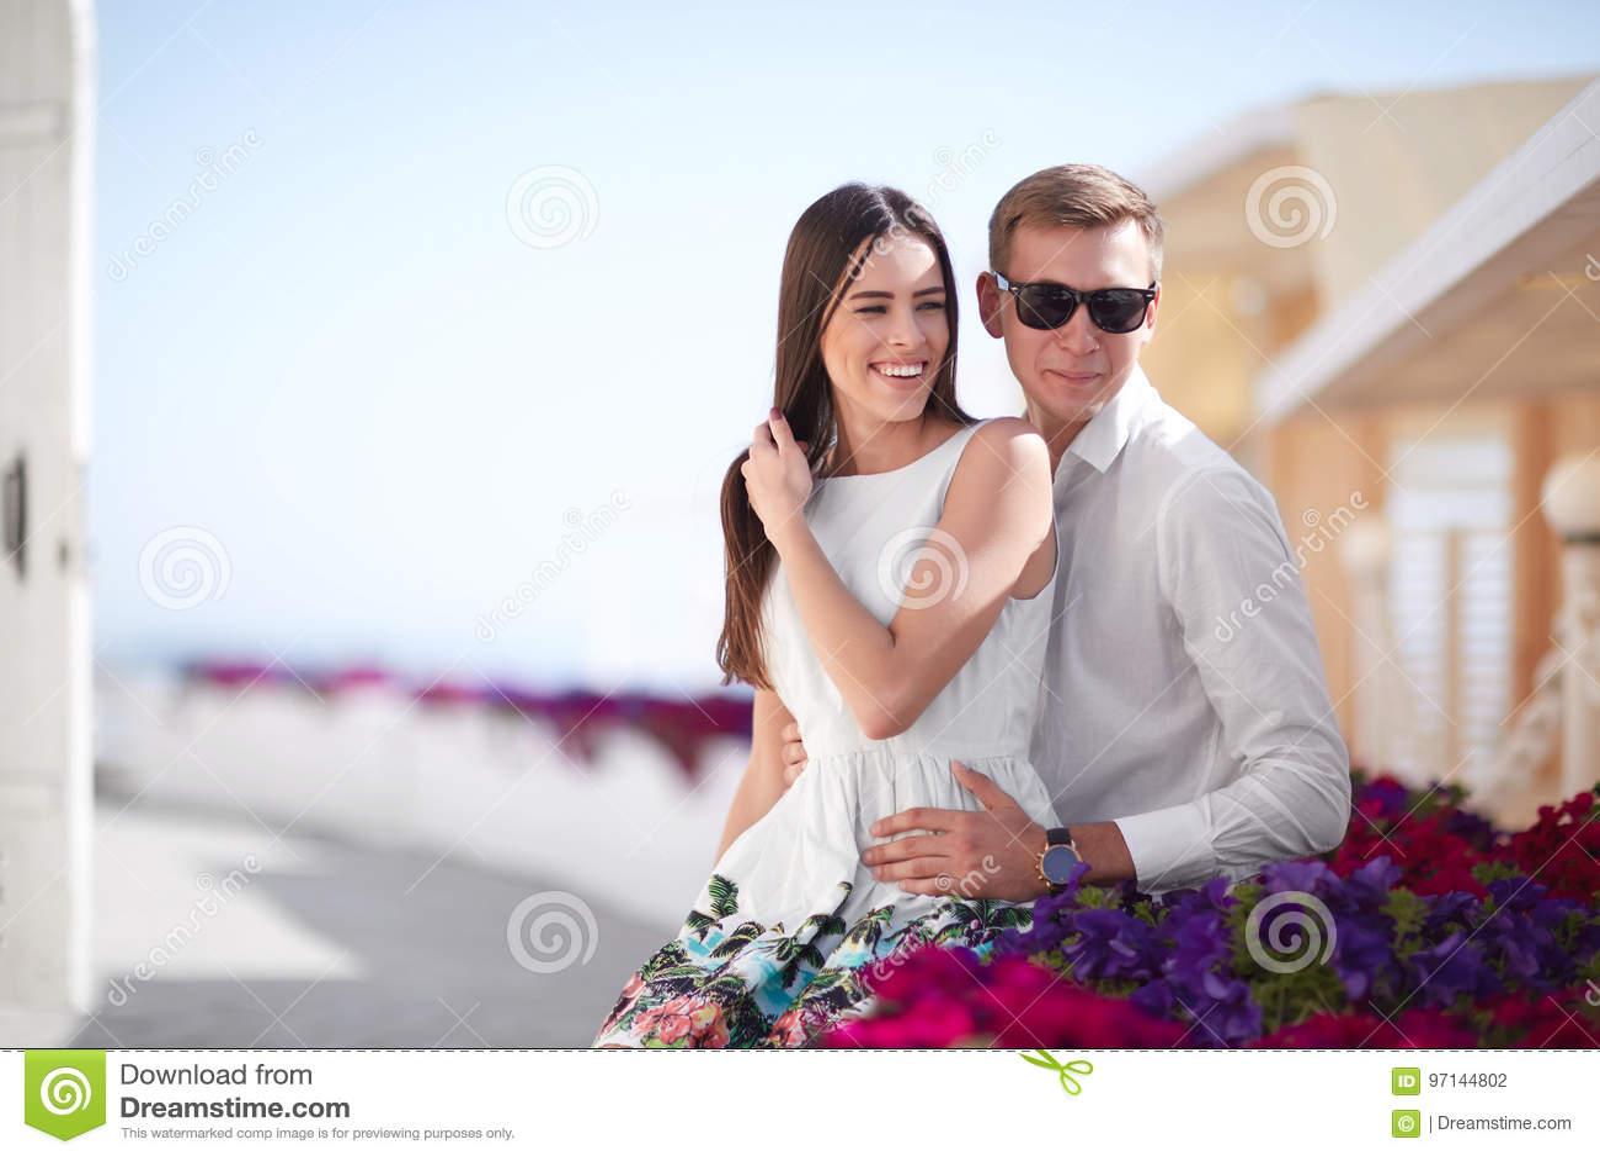 Males having summer romance